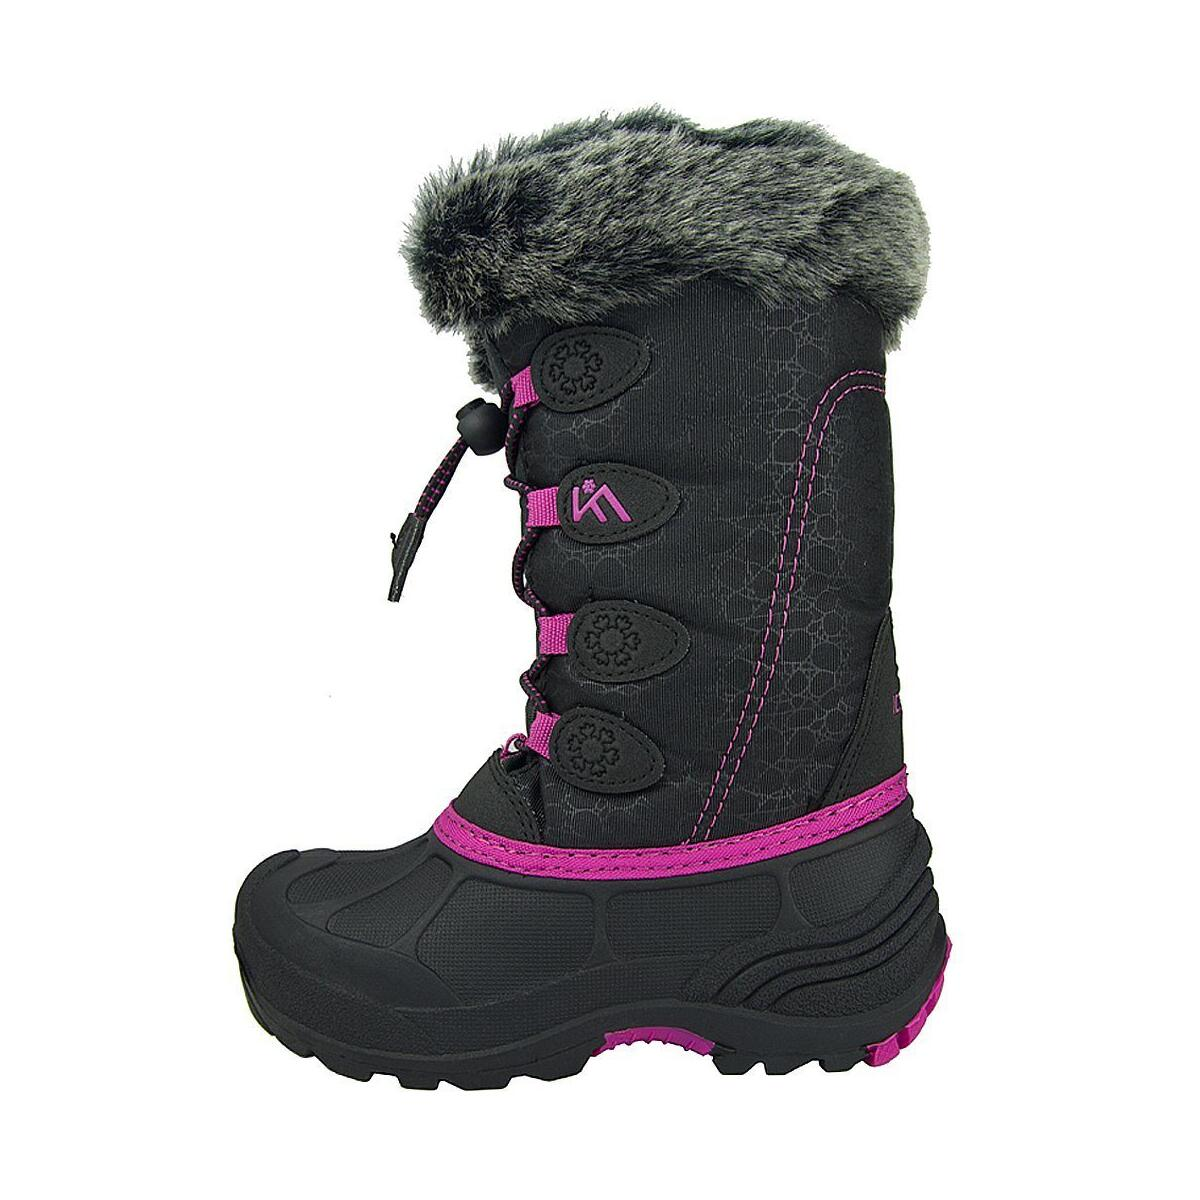 Kids Winter Snow Boots - Waterproof/Insulated